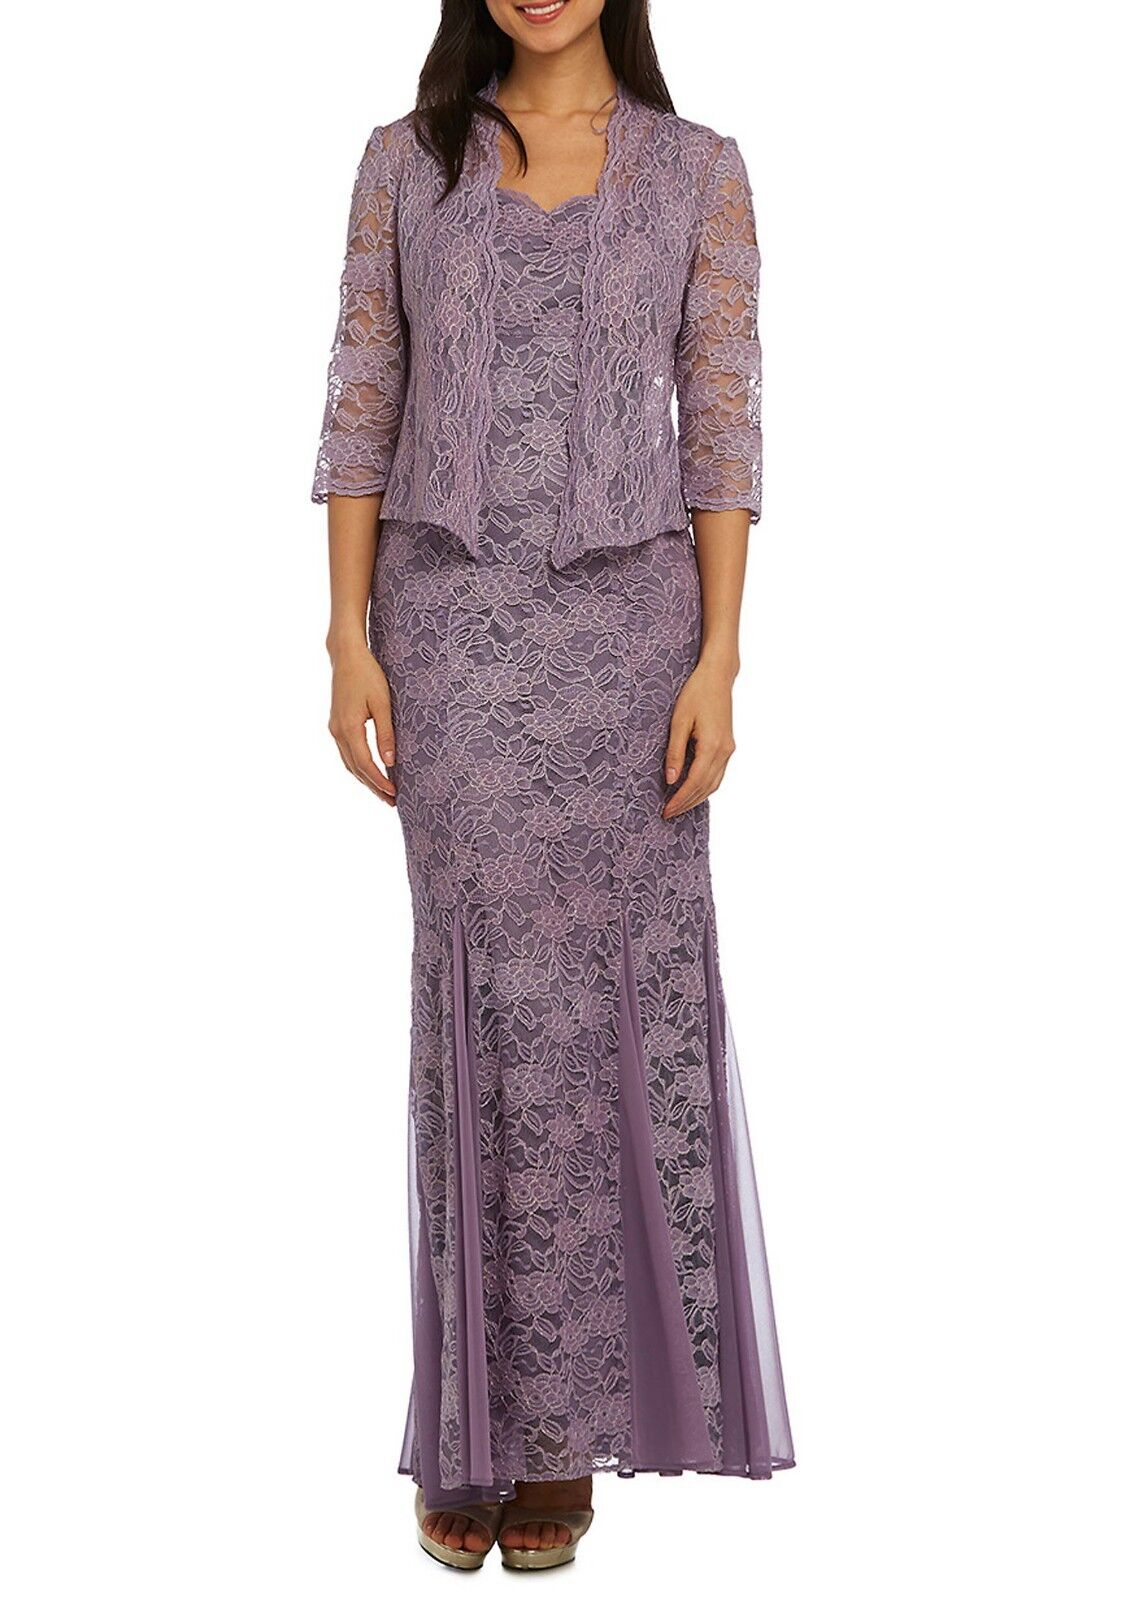 R&M RICHARDS® 8, 10, 14 Lilac Metallic Scallop Jacket Dress NWT